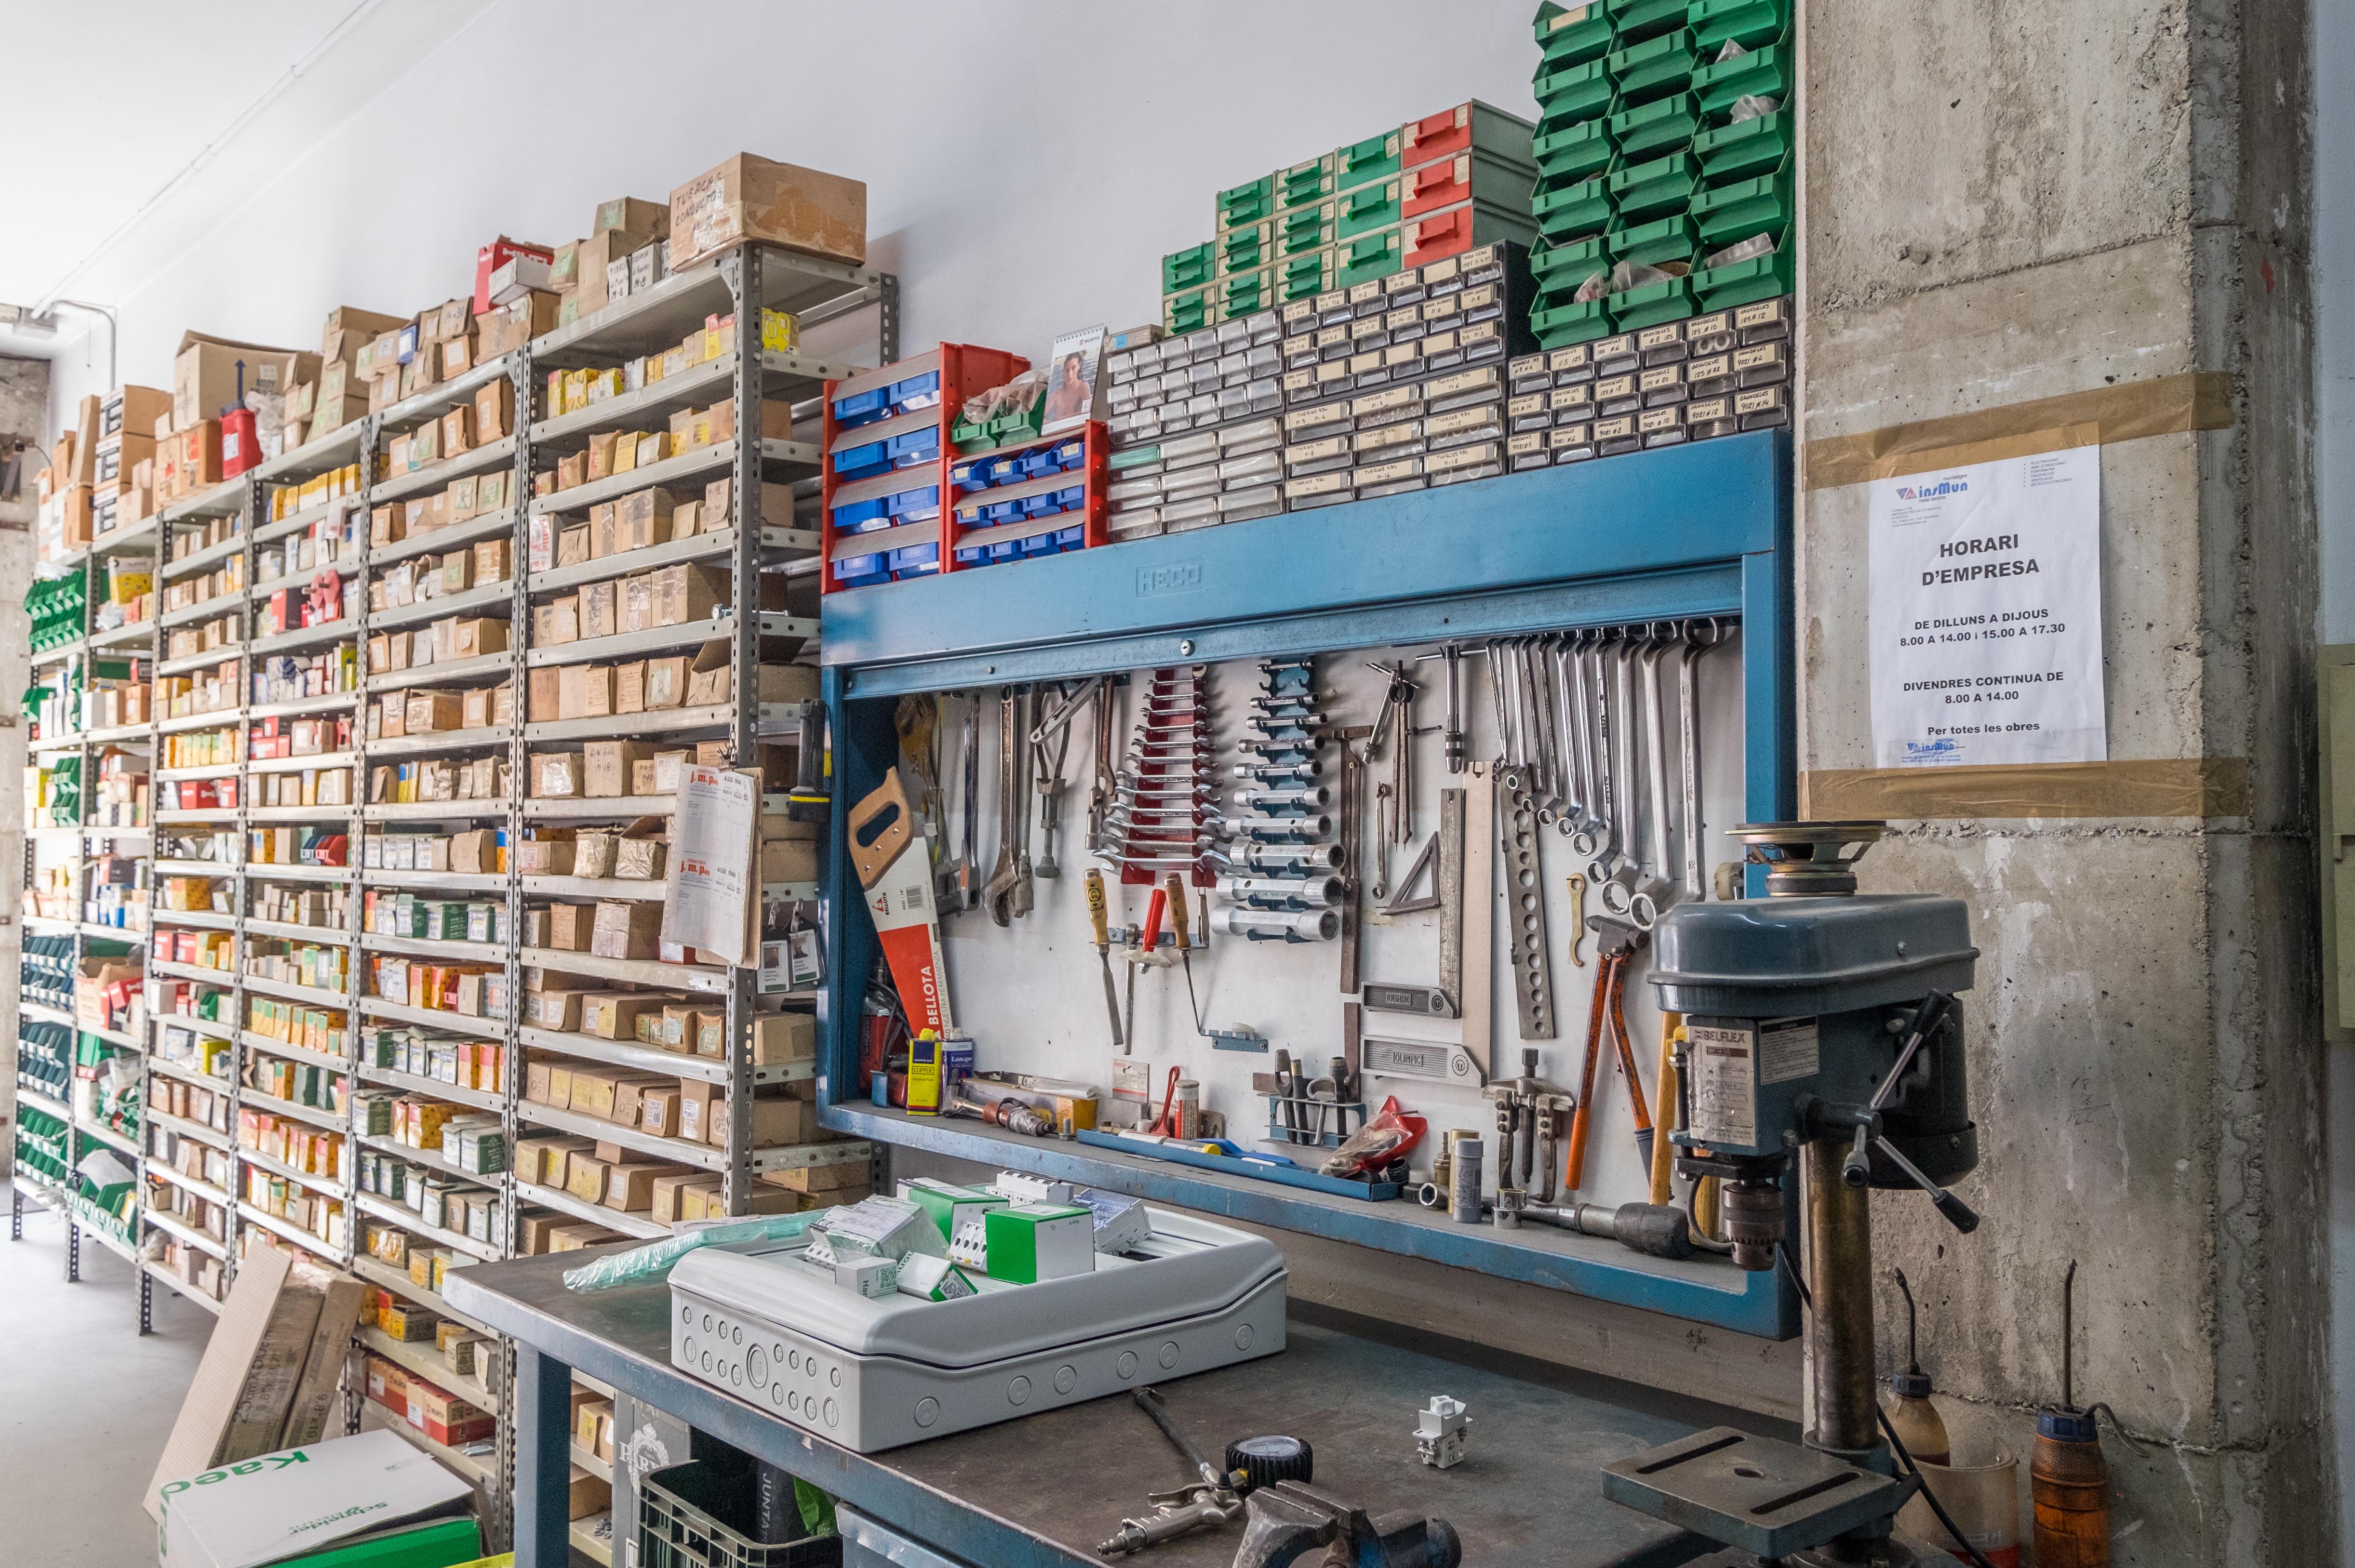 Nuestro taller de REPARACIONES en Sant Boi de Llobregat